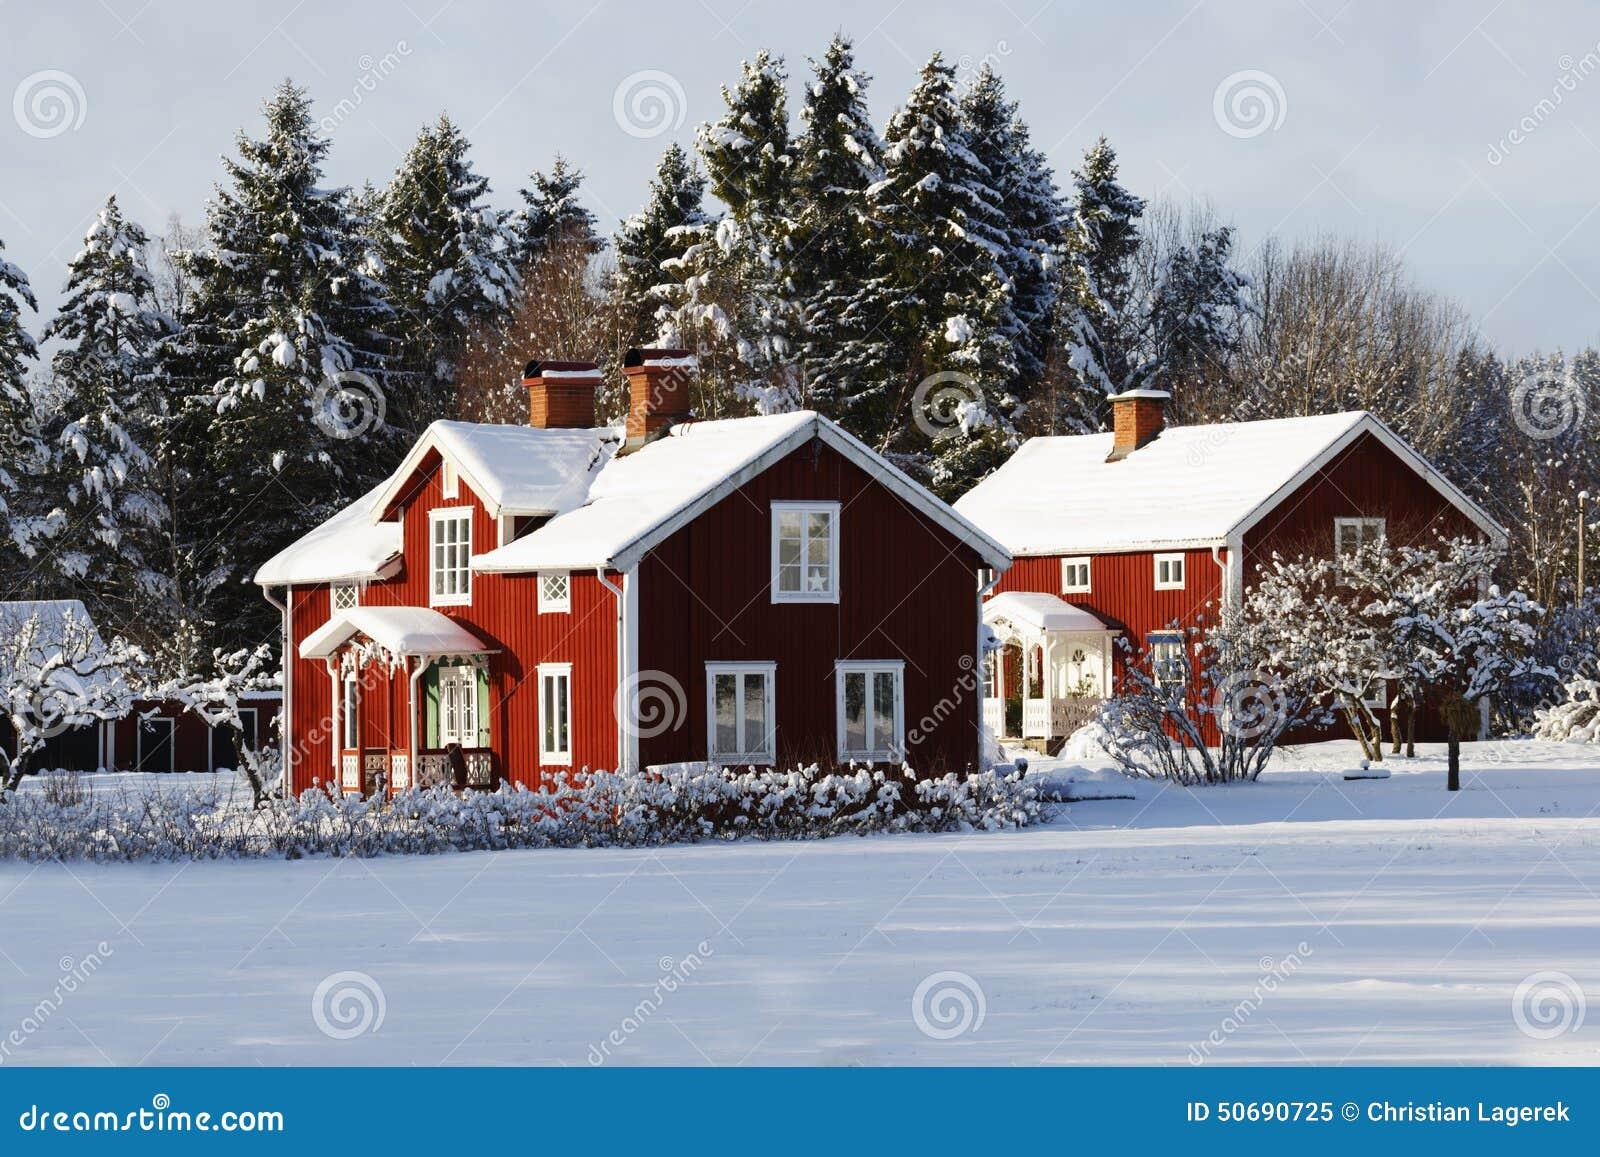 Download 红色村庄,多雪的冬天风景的农场 库存图片. 图片 包括有 平安, 农村, 风景, 冬天, 村庄, 乡情, 反气旋 - 50690725